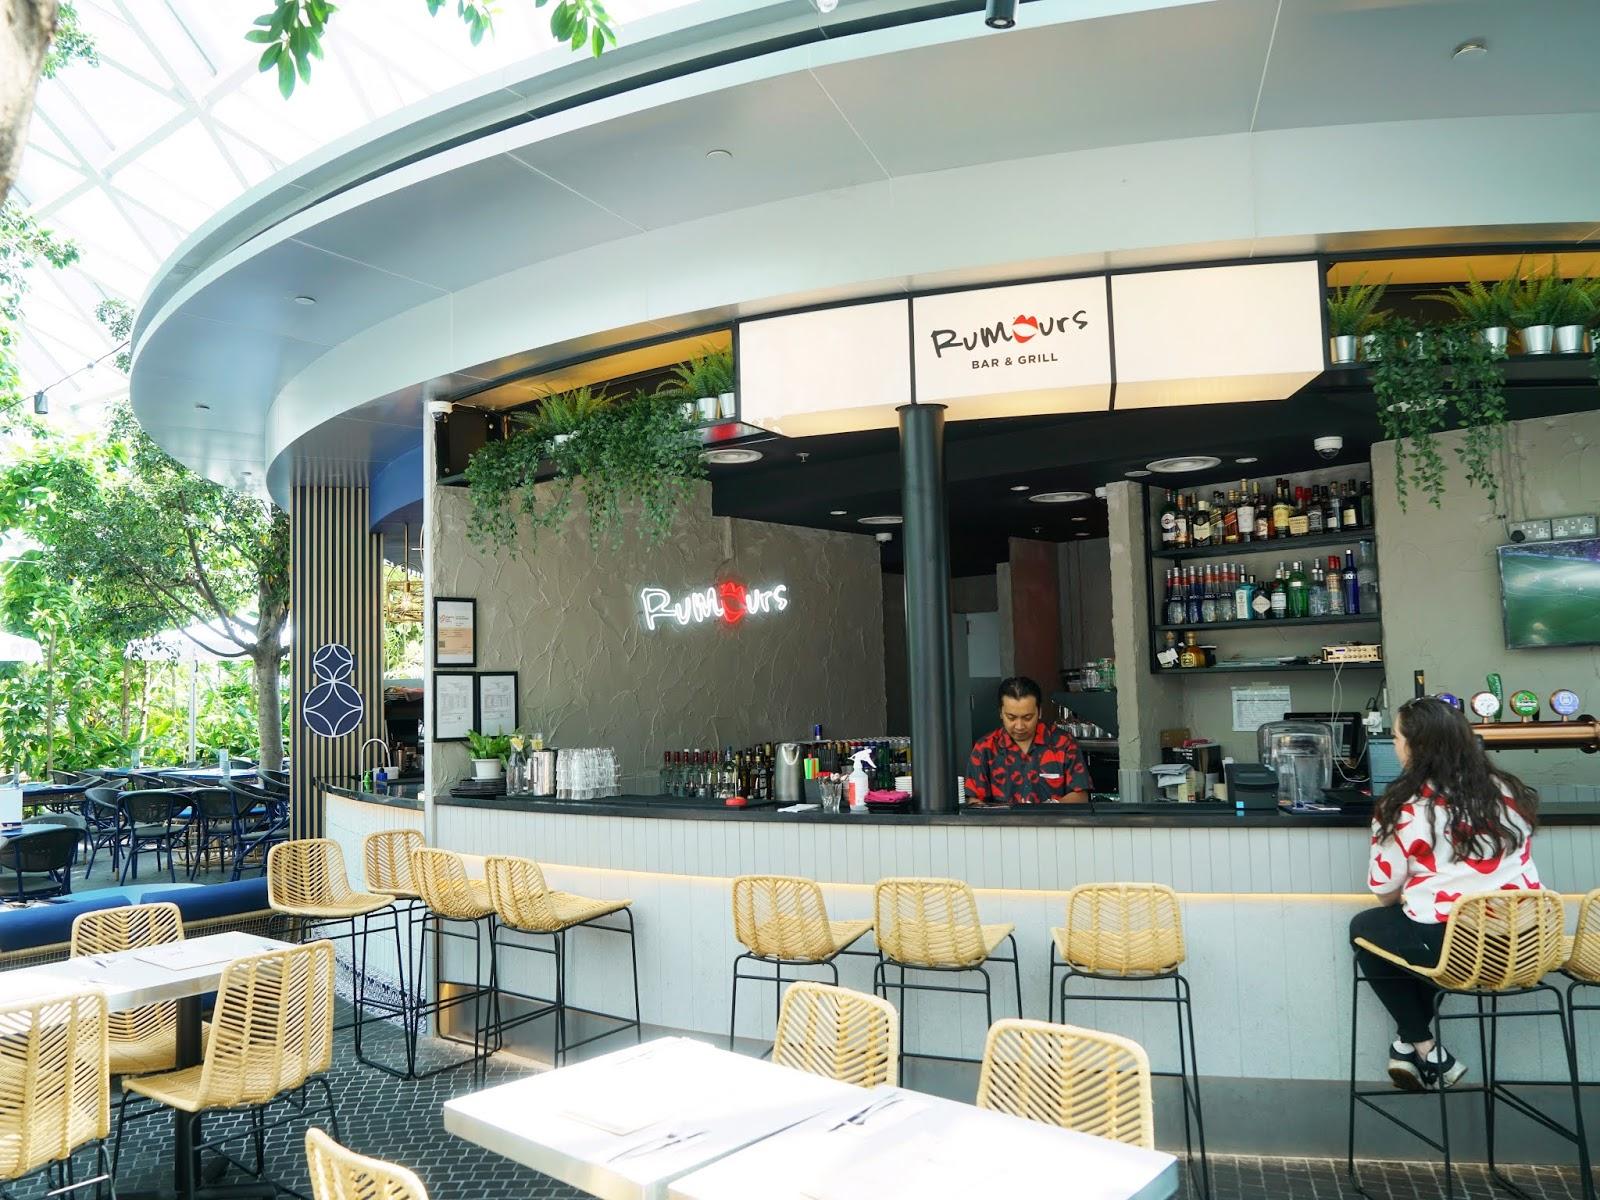 Rumors Bar And Grill >> Pinkypiggu Rumours Bar Grill Jewel Changi Airport